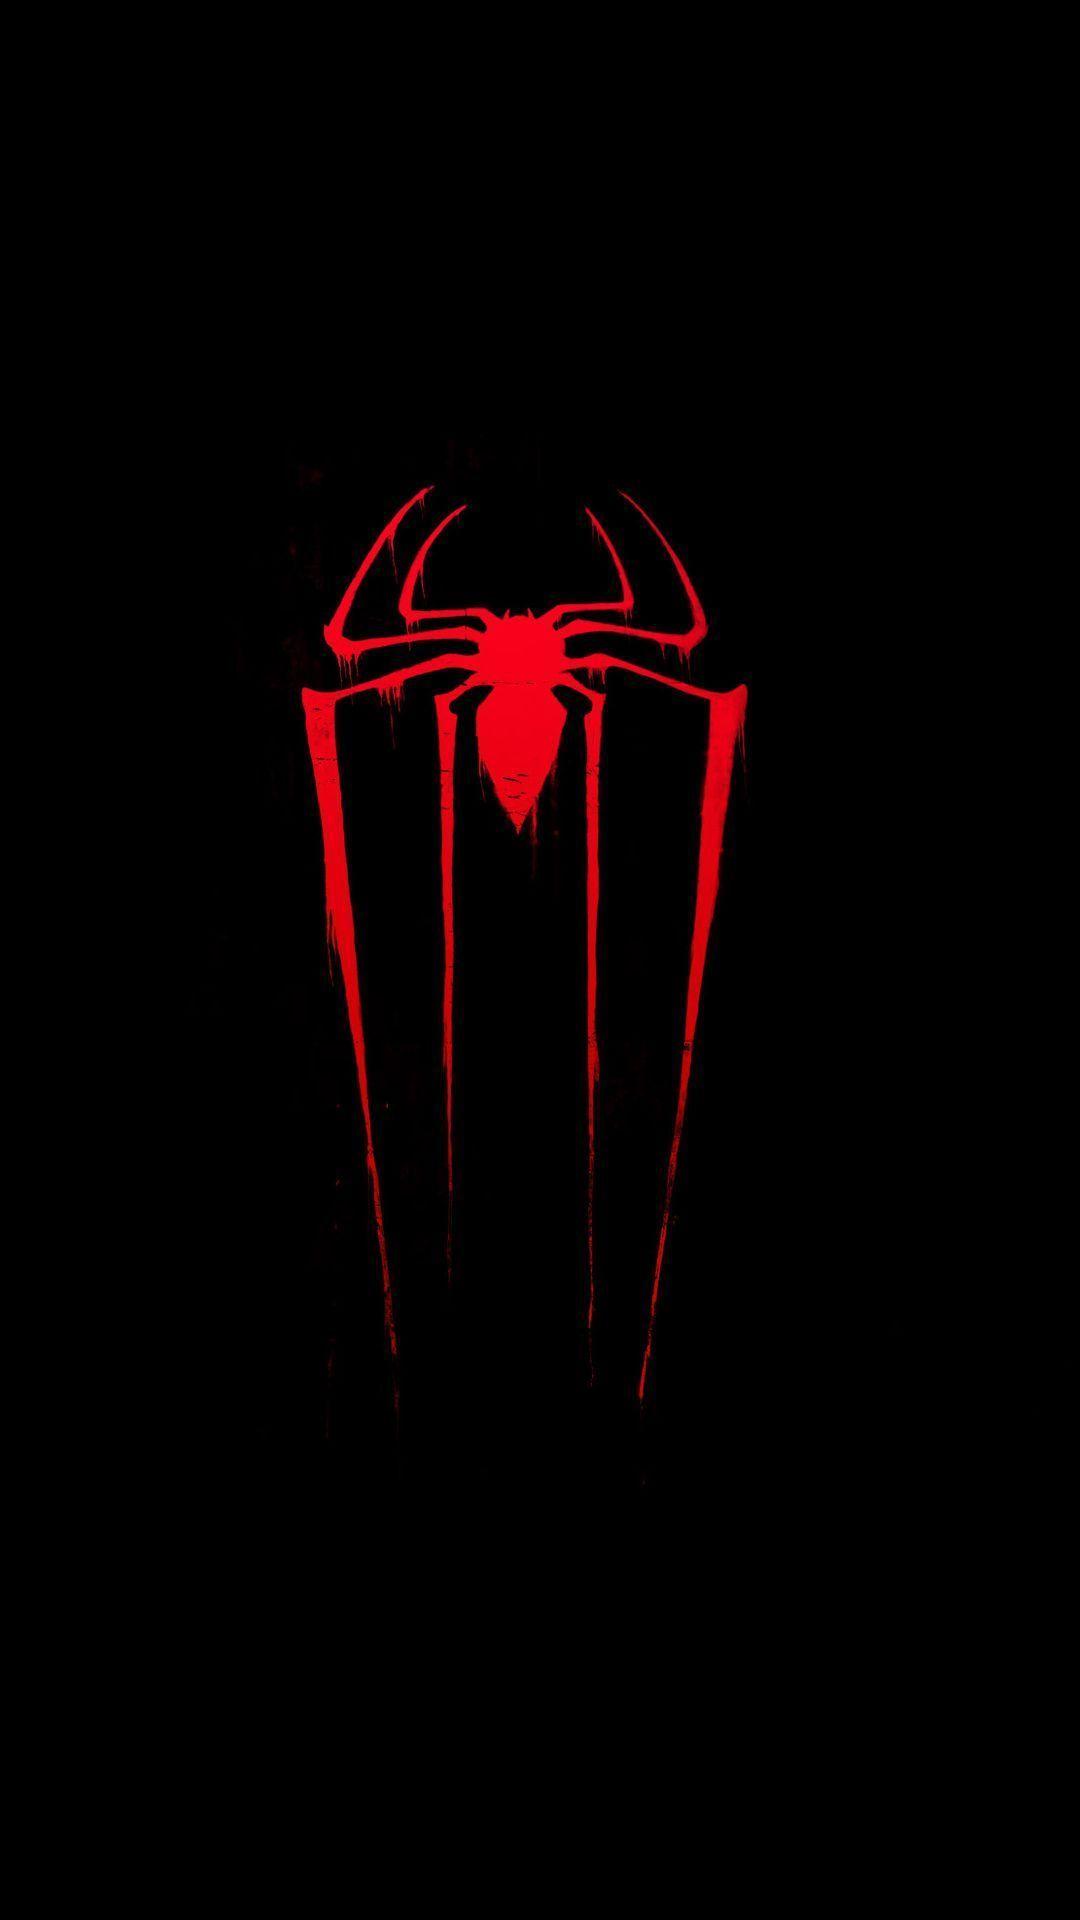 Spider Man Superhero Wallpaper Superhero Symbols Avengers Wallpaper